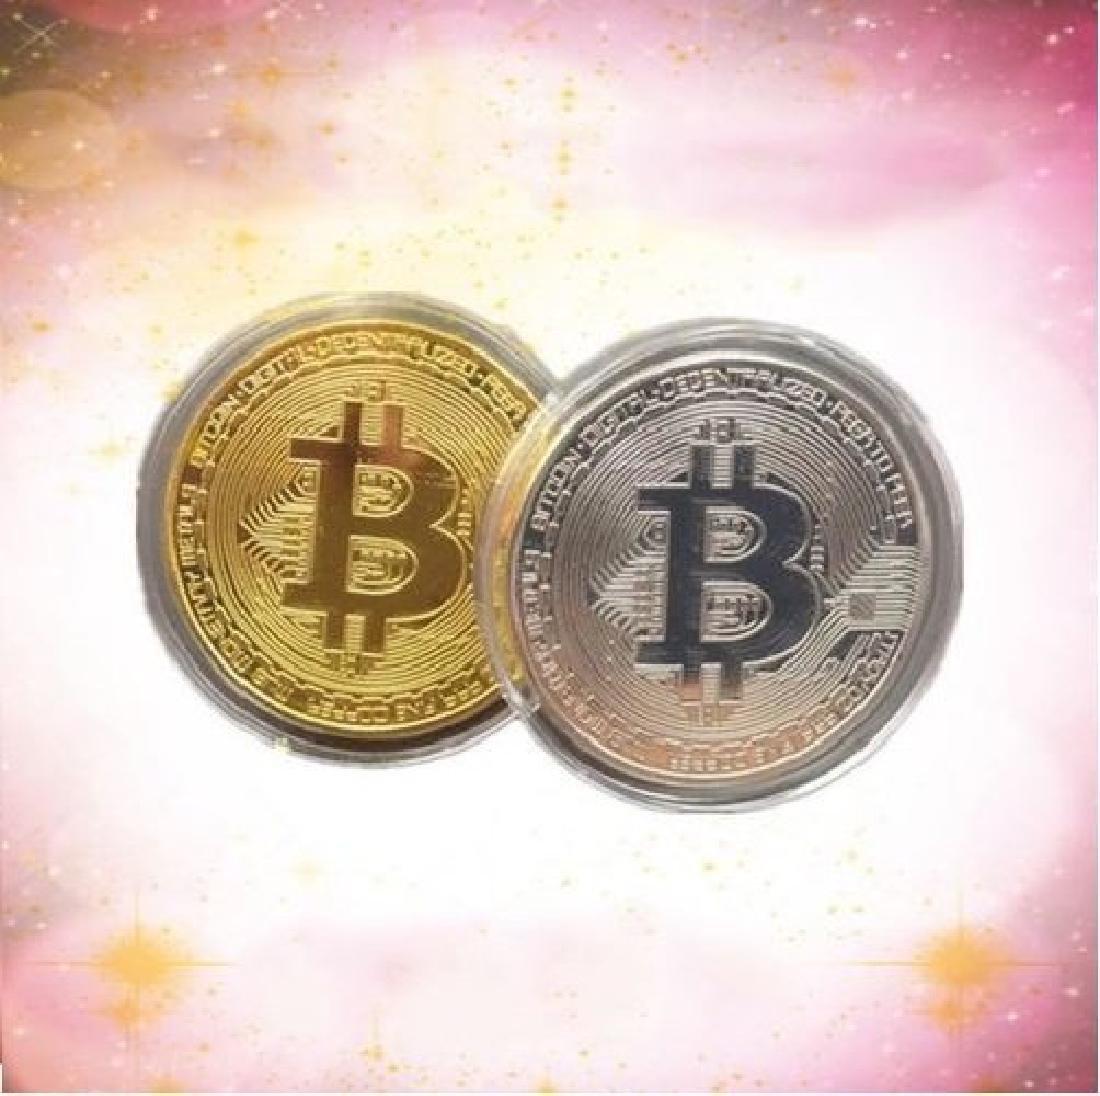 1 PCS Gold Plated Bitcoin Litecoin Ethereum Coins